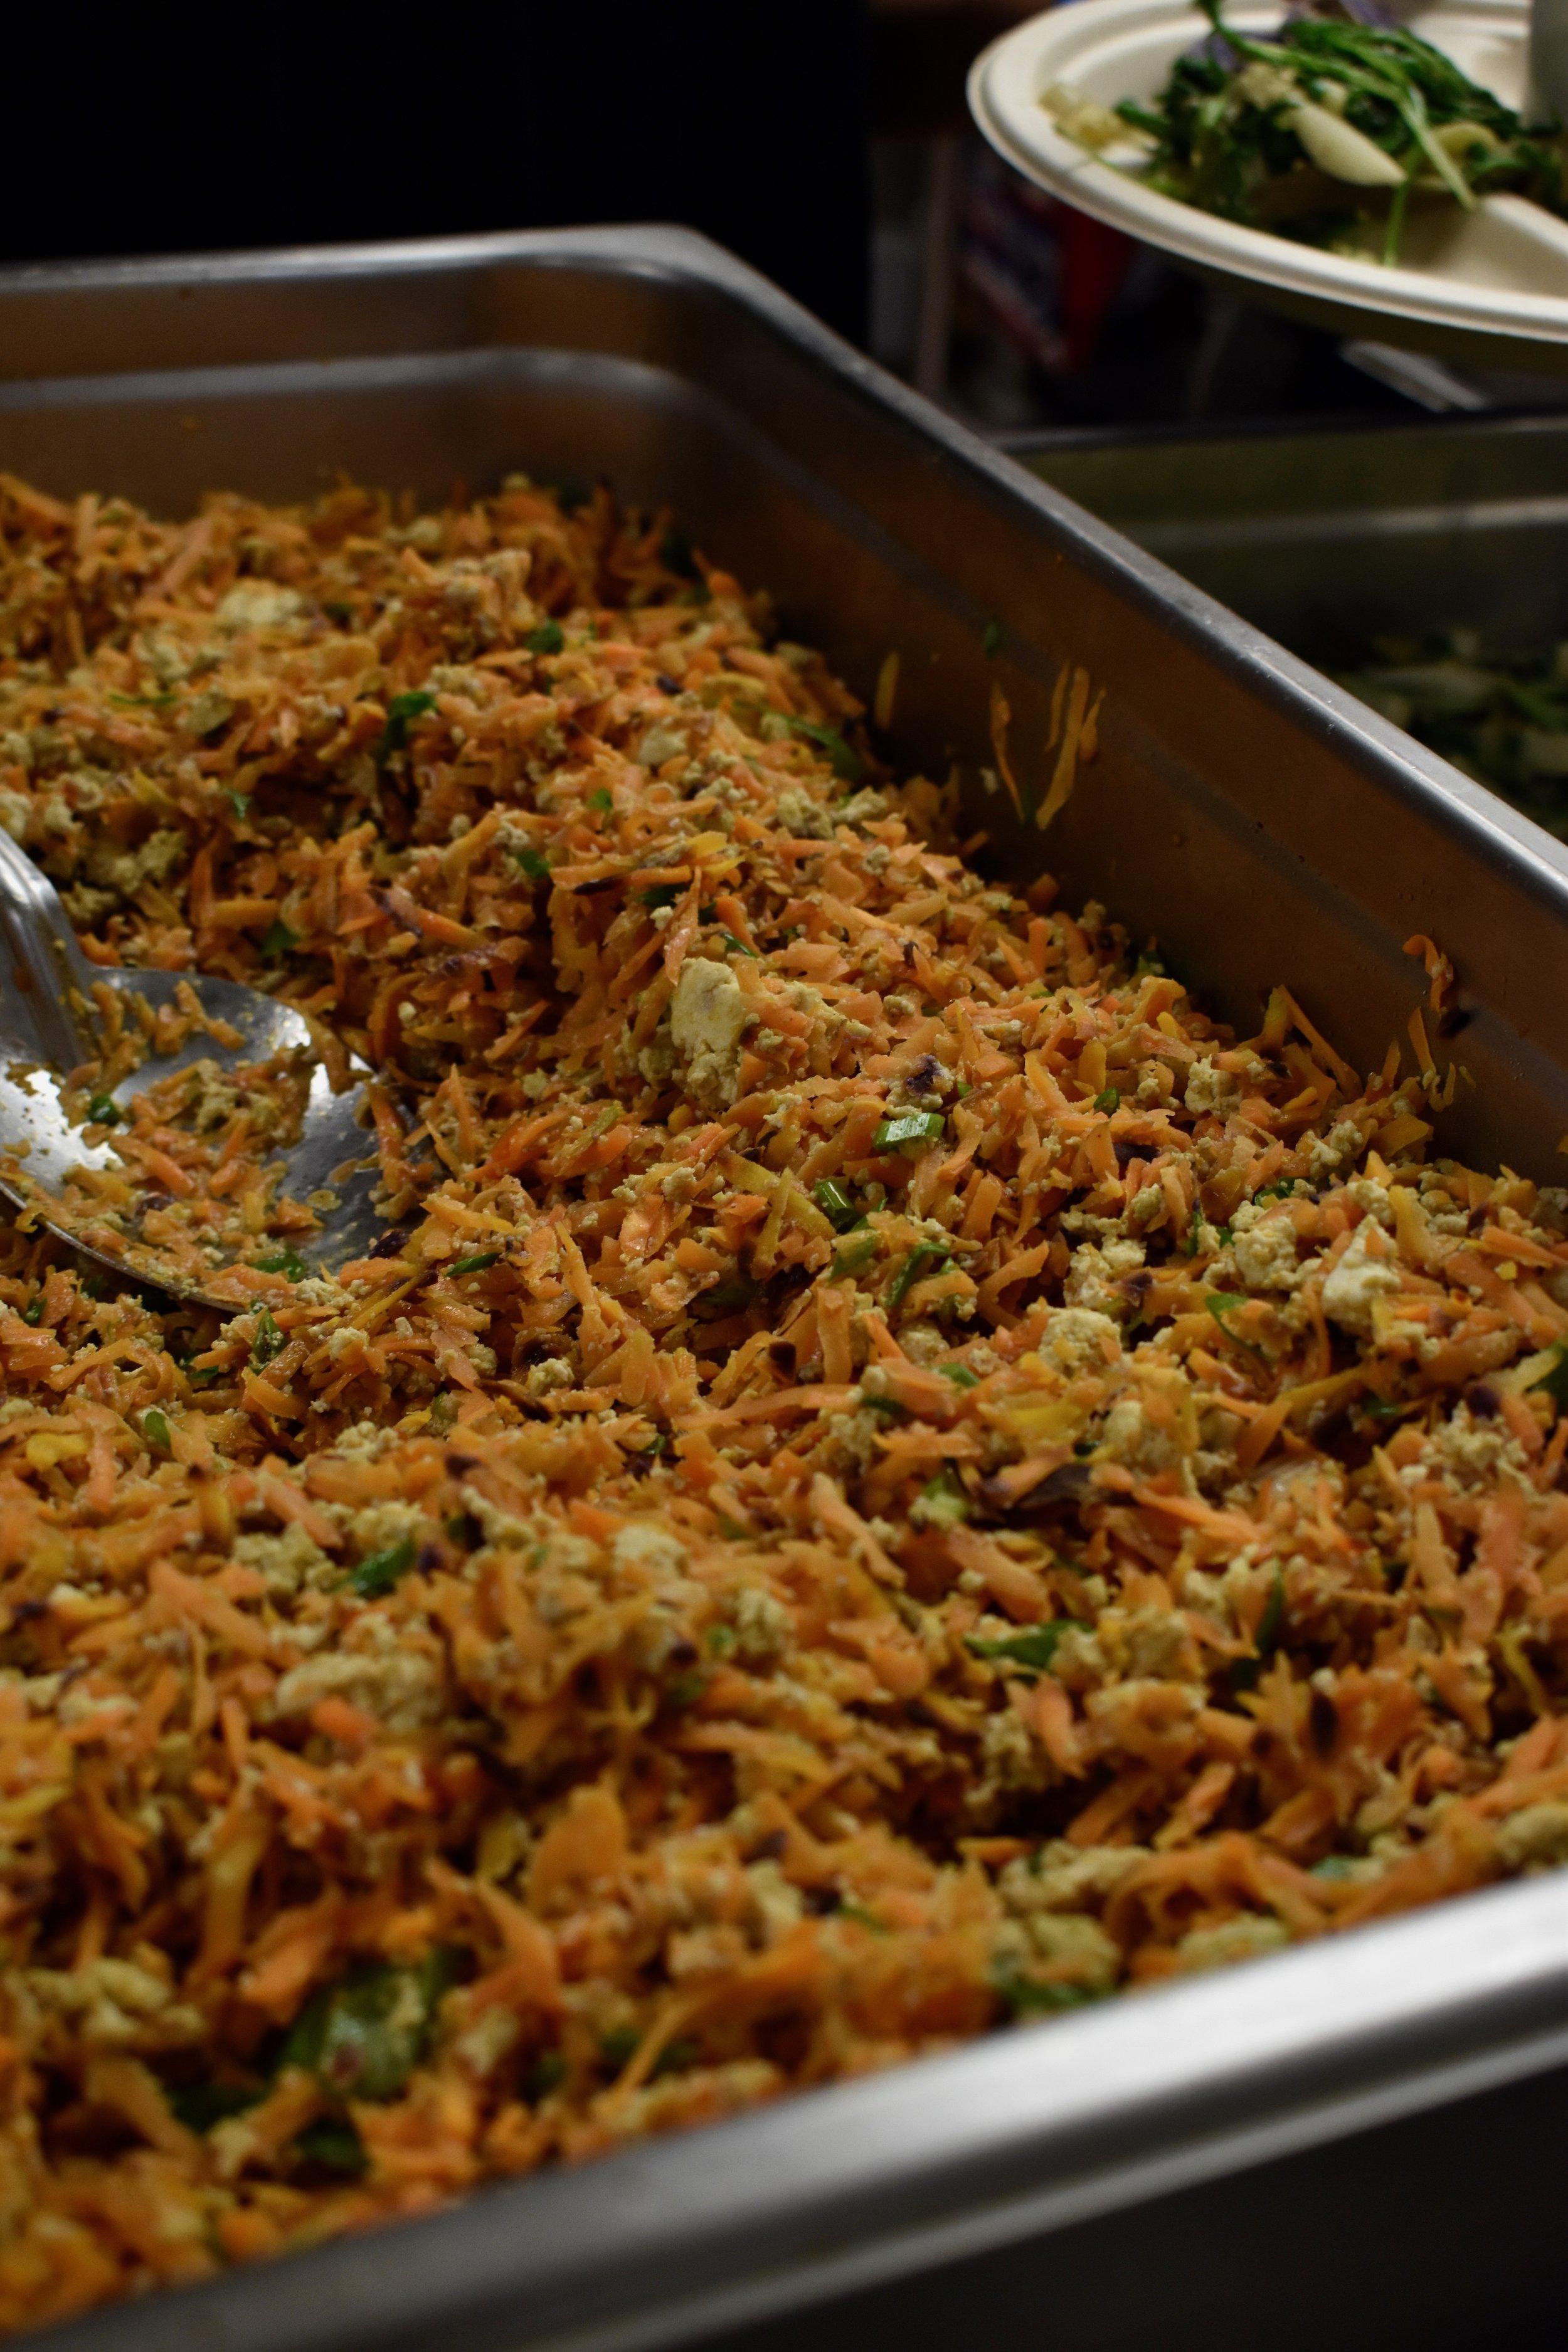 Ninjin Shirishiri - Kahumana Farms carrot and Mrs. Cheng's tofu stir-fry with Kolea Farm green onionBy Aiko Yamashiro